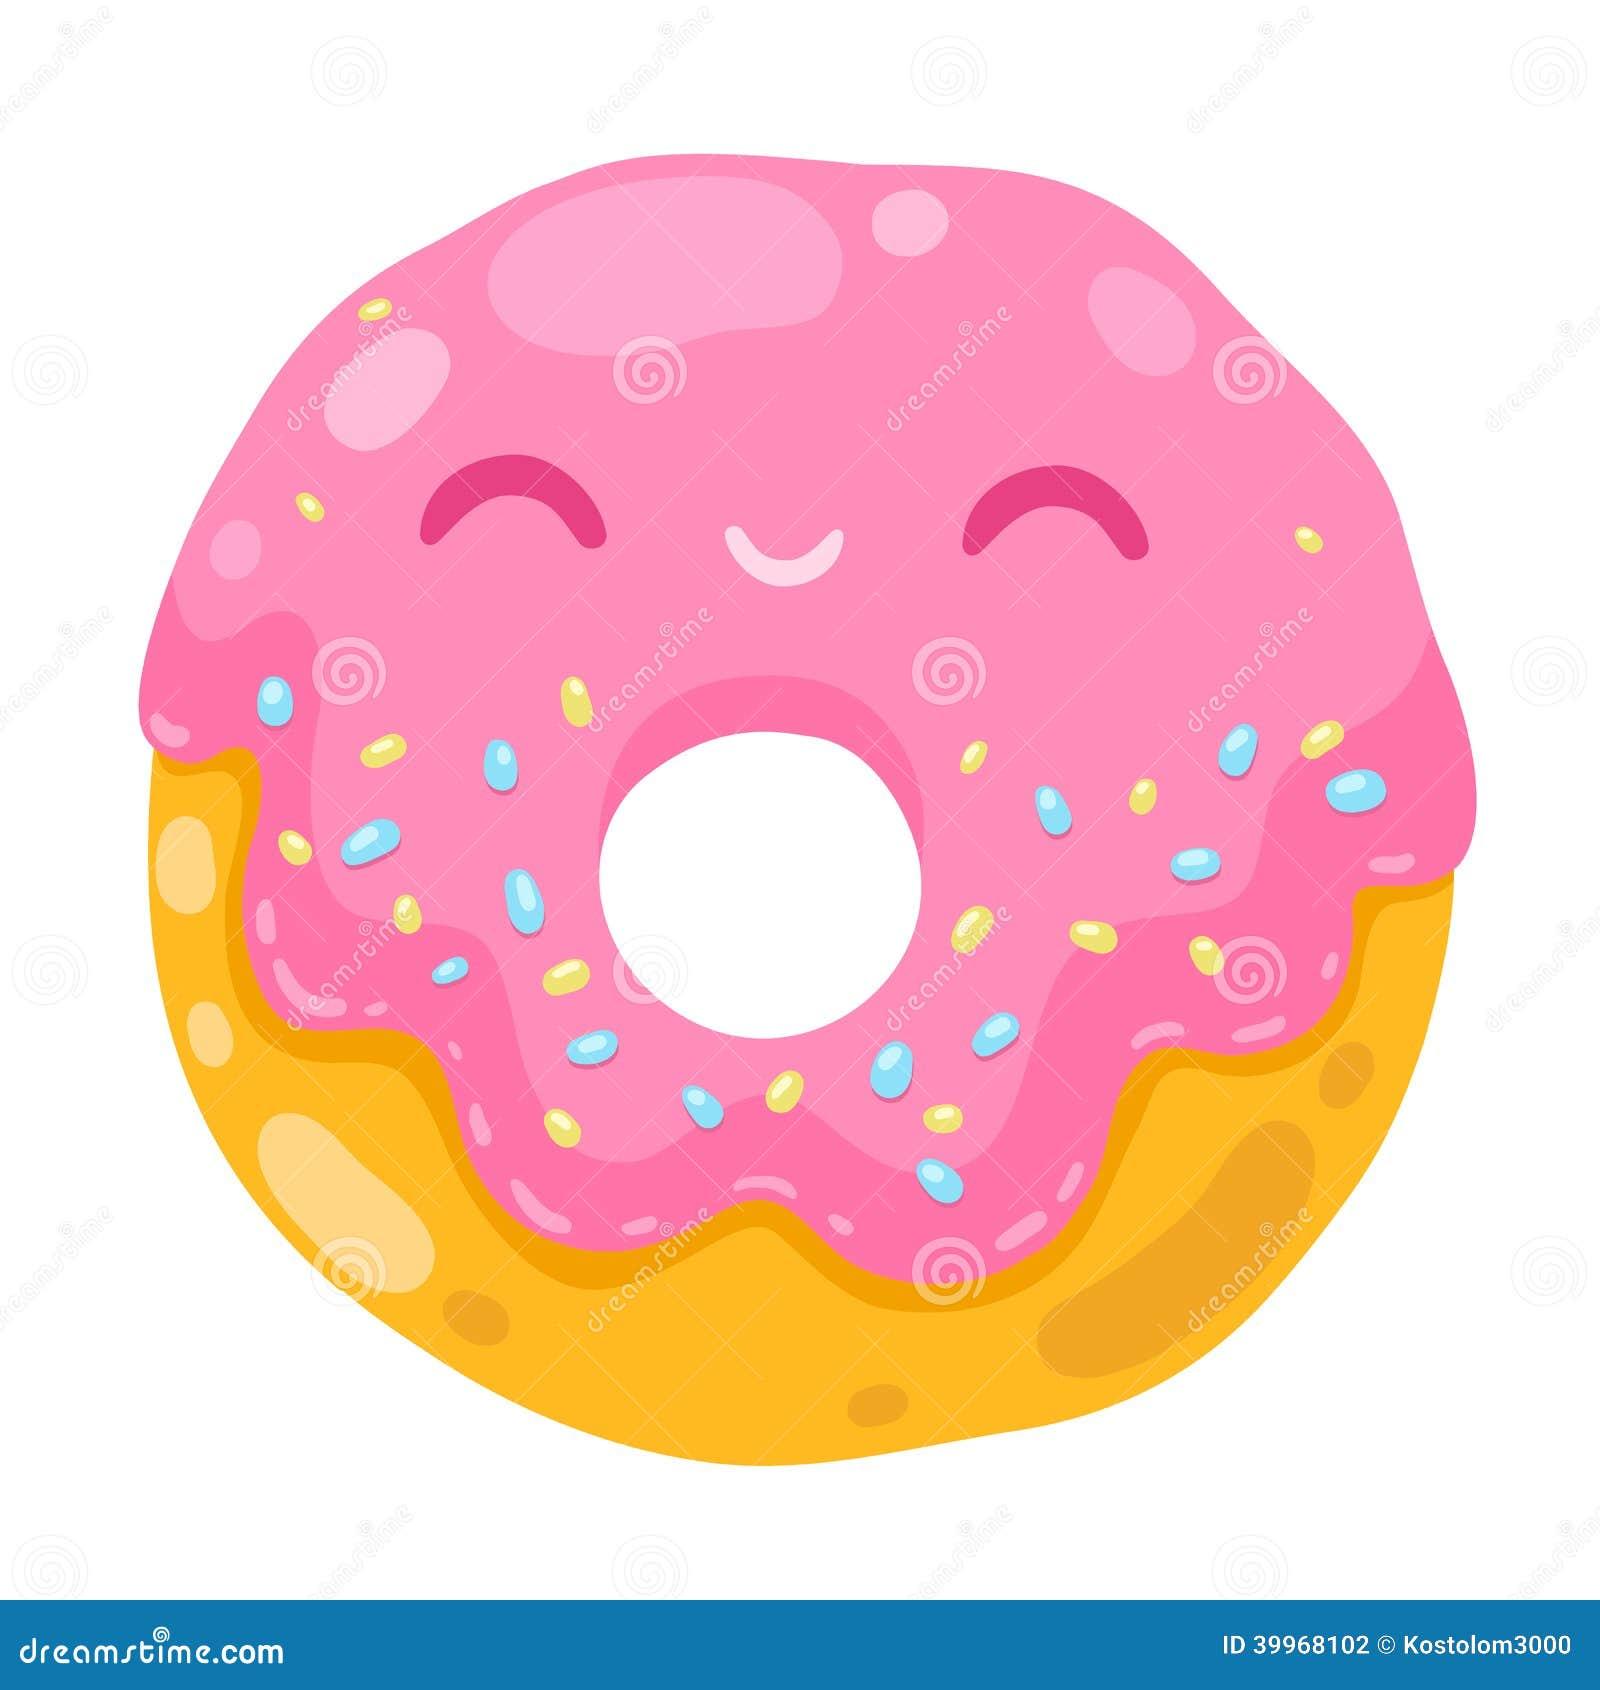 cute smiling donut cartoon food illustration stock vector rh dreamstime com